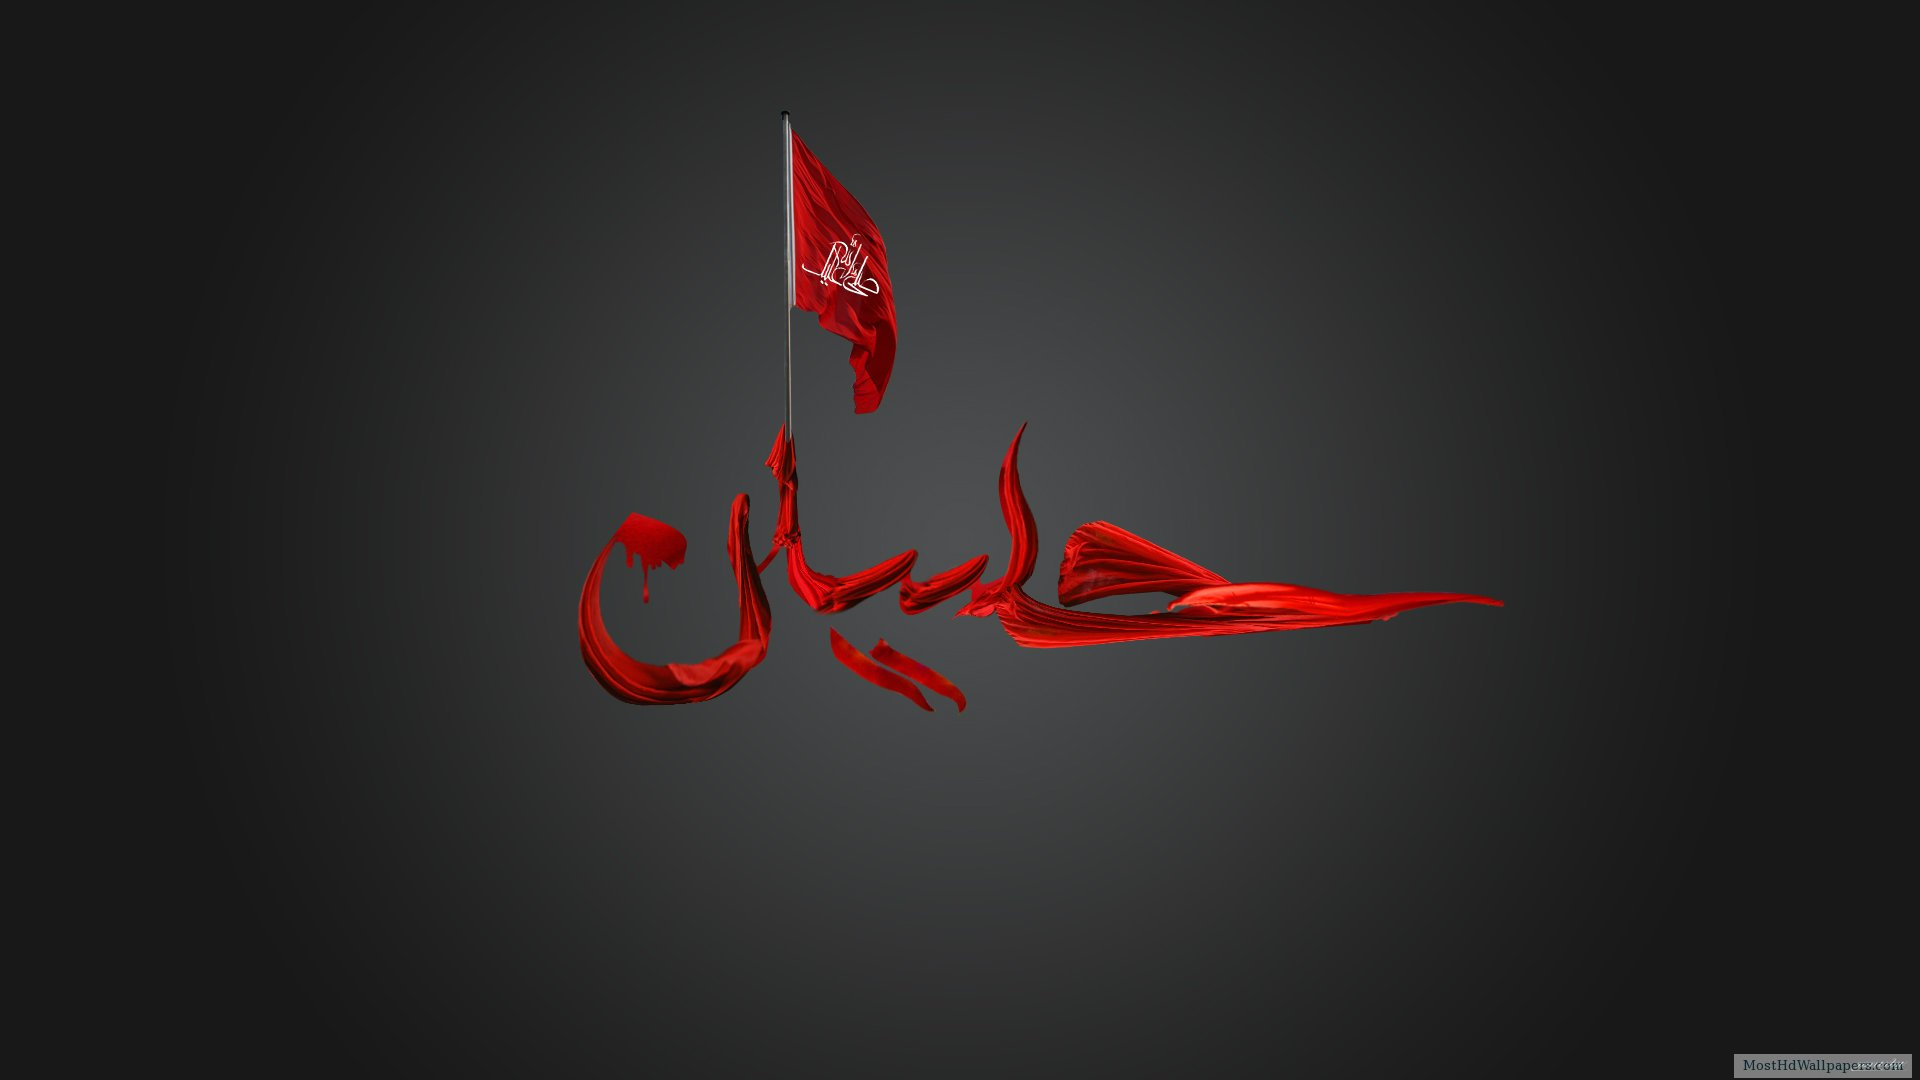 Hd wallpaper ya hussain - Ya Hussain Most Beautiful Wallpaper Most Hd Wallpapers Pictures